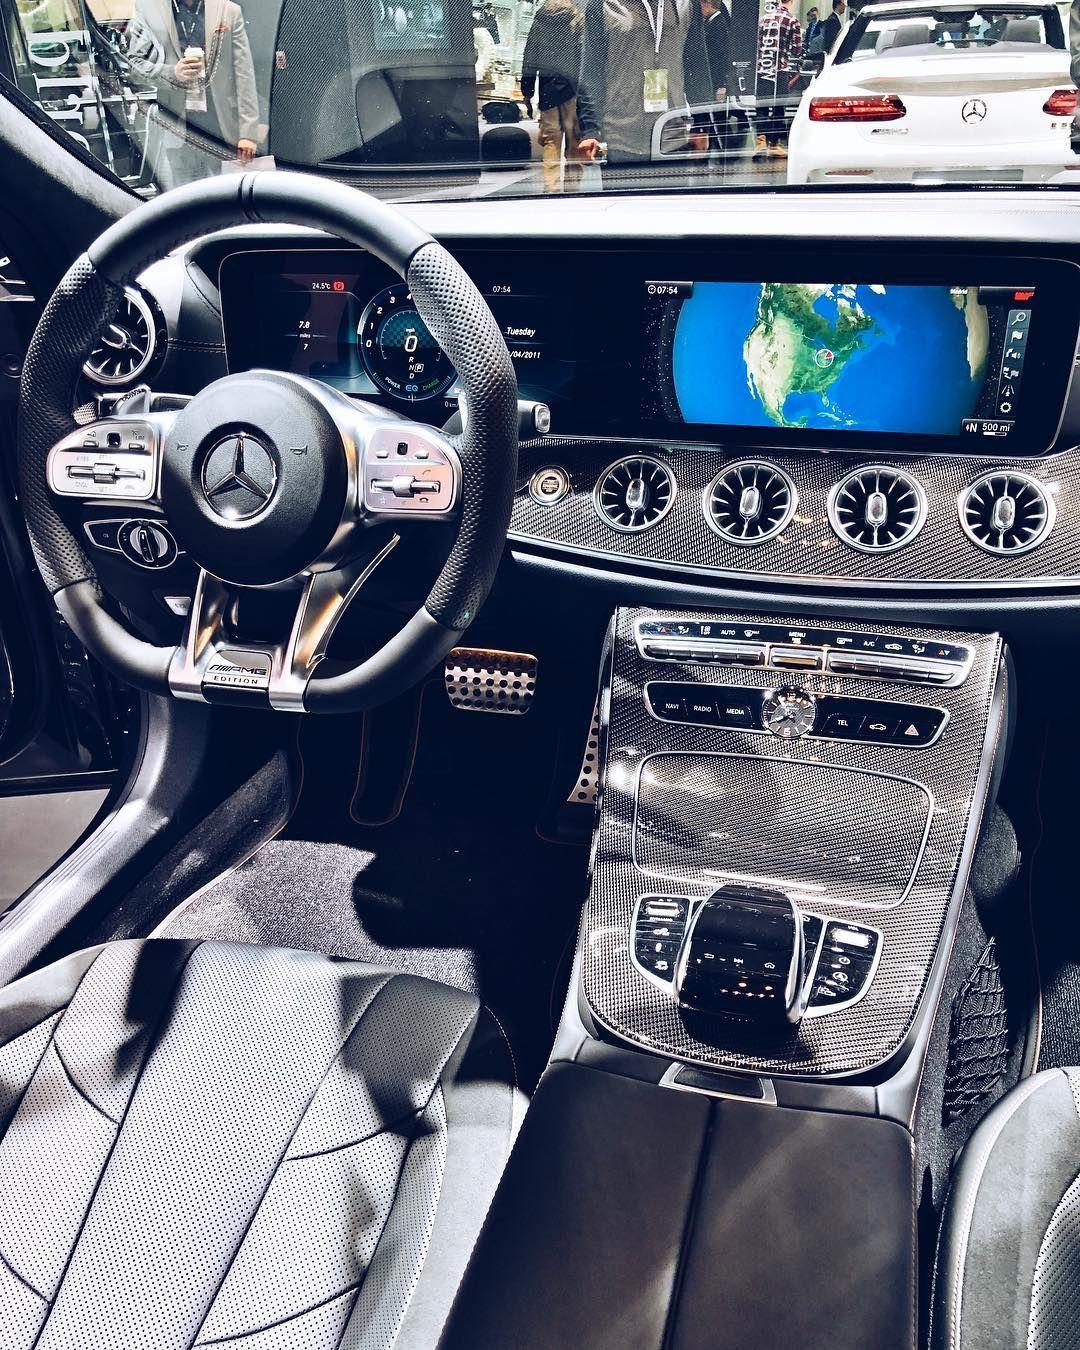 Mercedes Amg Cls 53 4m Edition 1 Mercedesamg Cls53 Mbusa